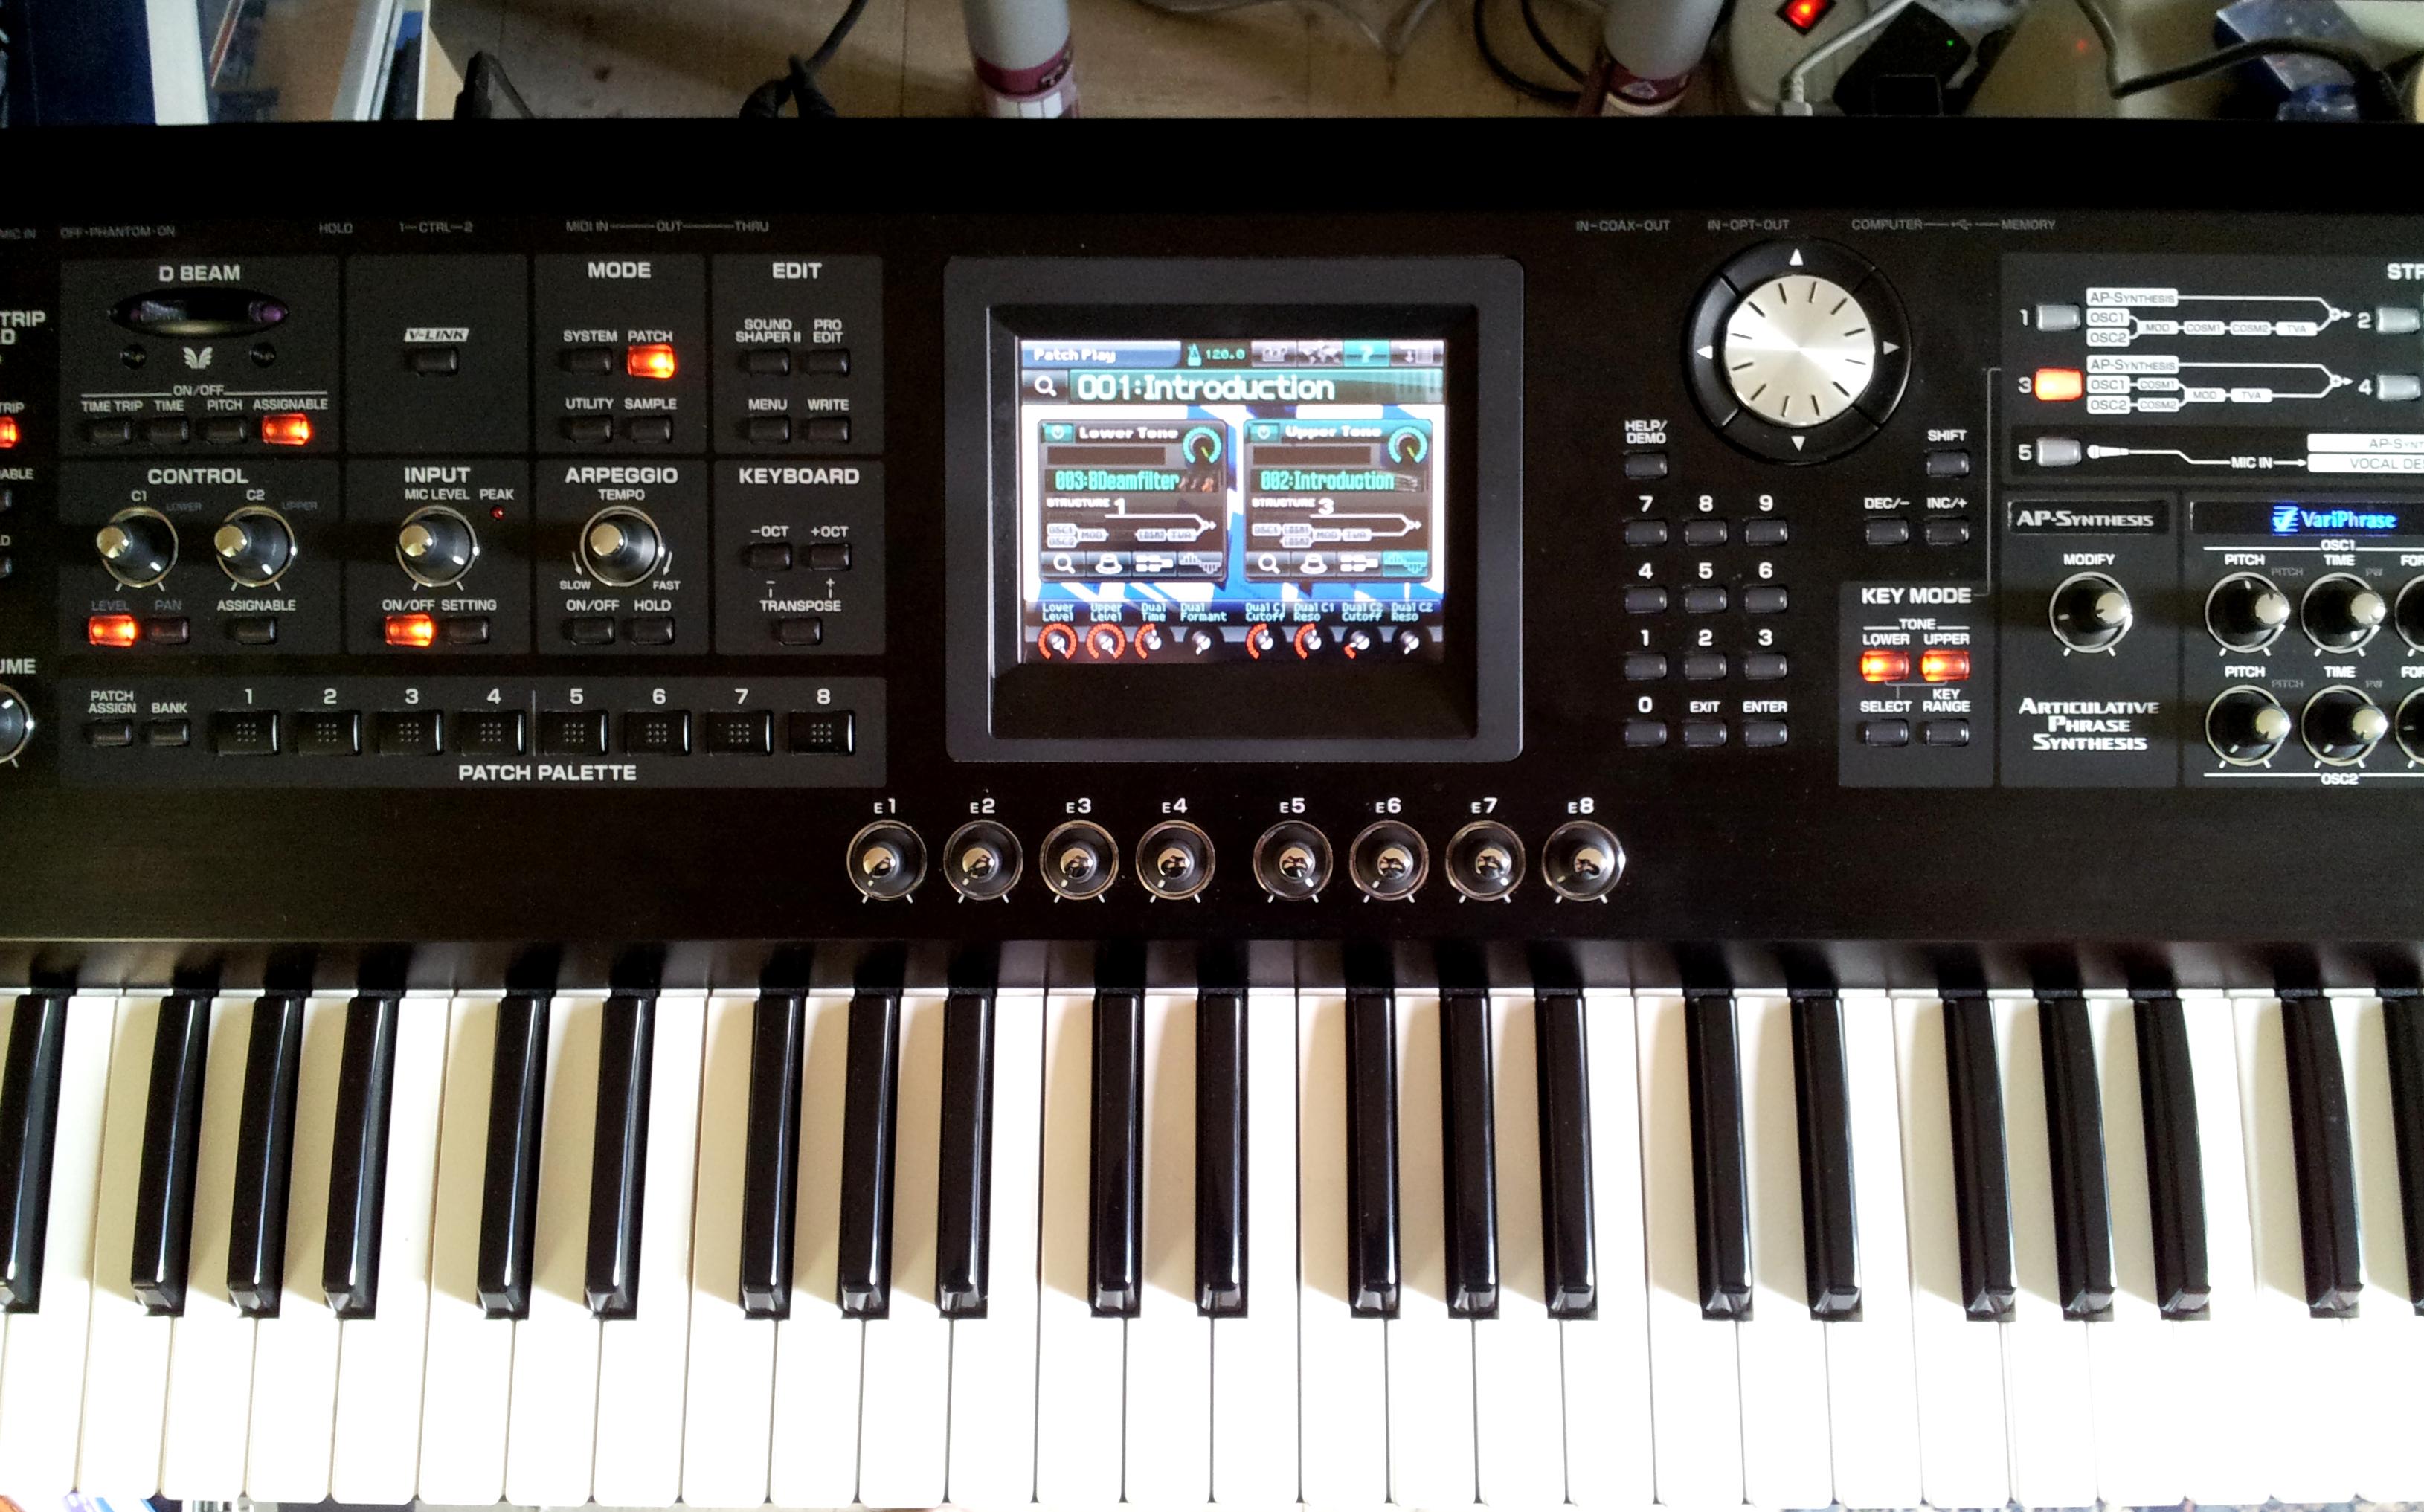 roland v synth gt image 388256 audiofanzine rh en audiofanzine com roland v synth gt service manual Roland X6